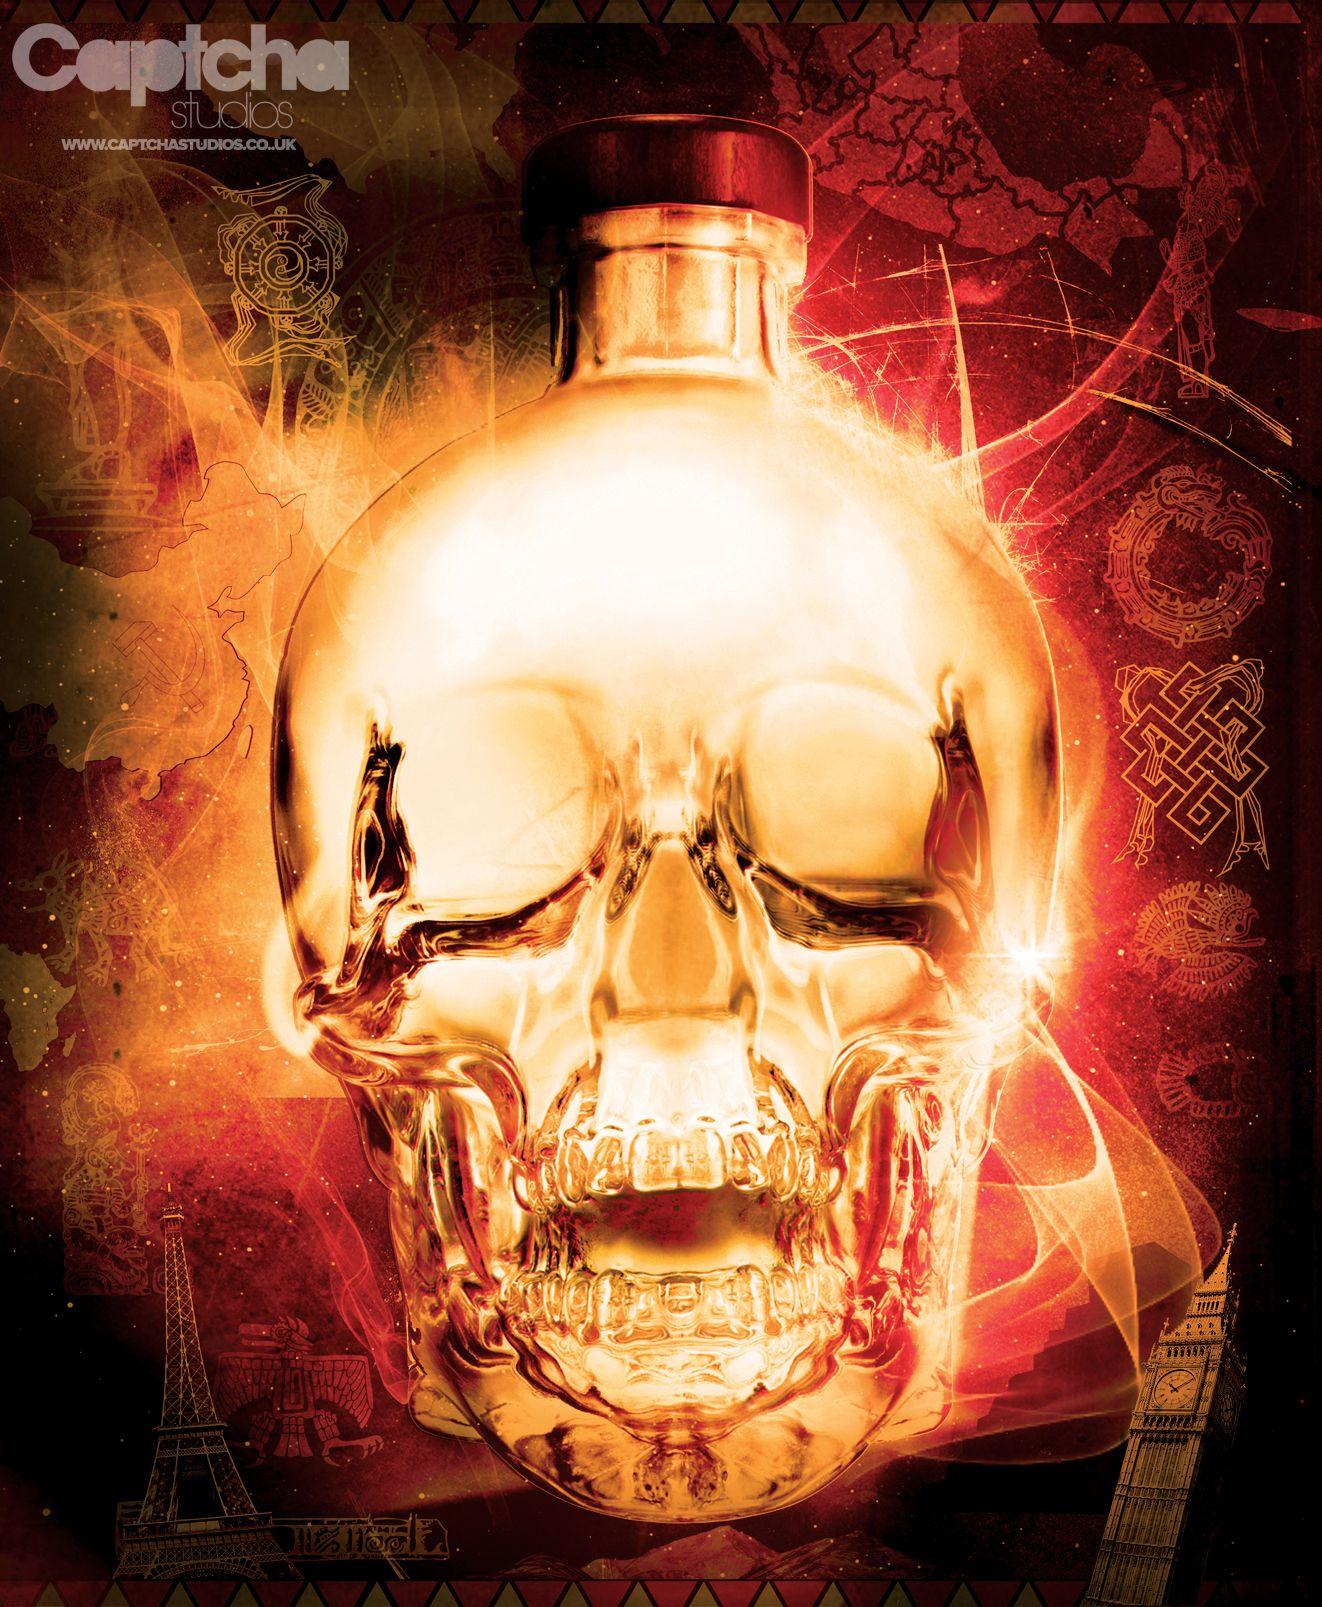 Crystal Head Vodka - Entry 1 - Based on the mythology of the Crystal Skull